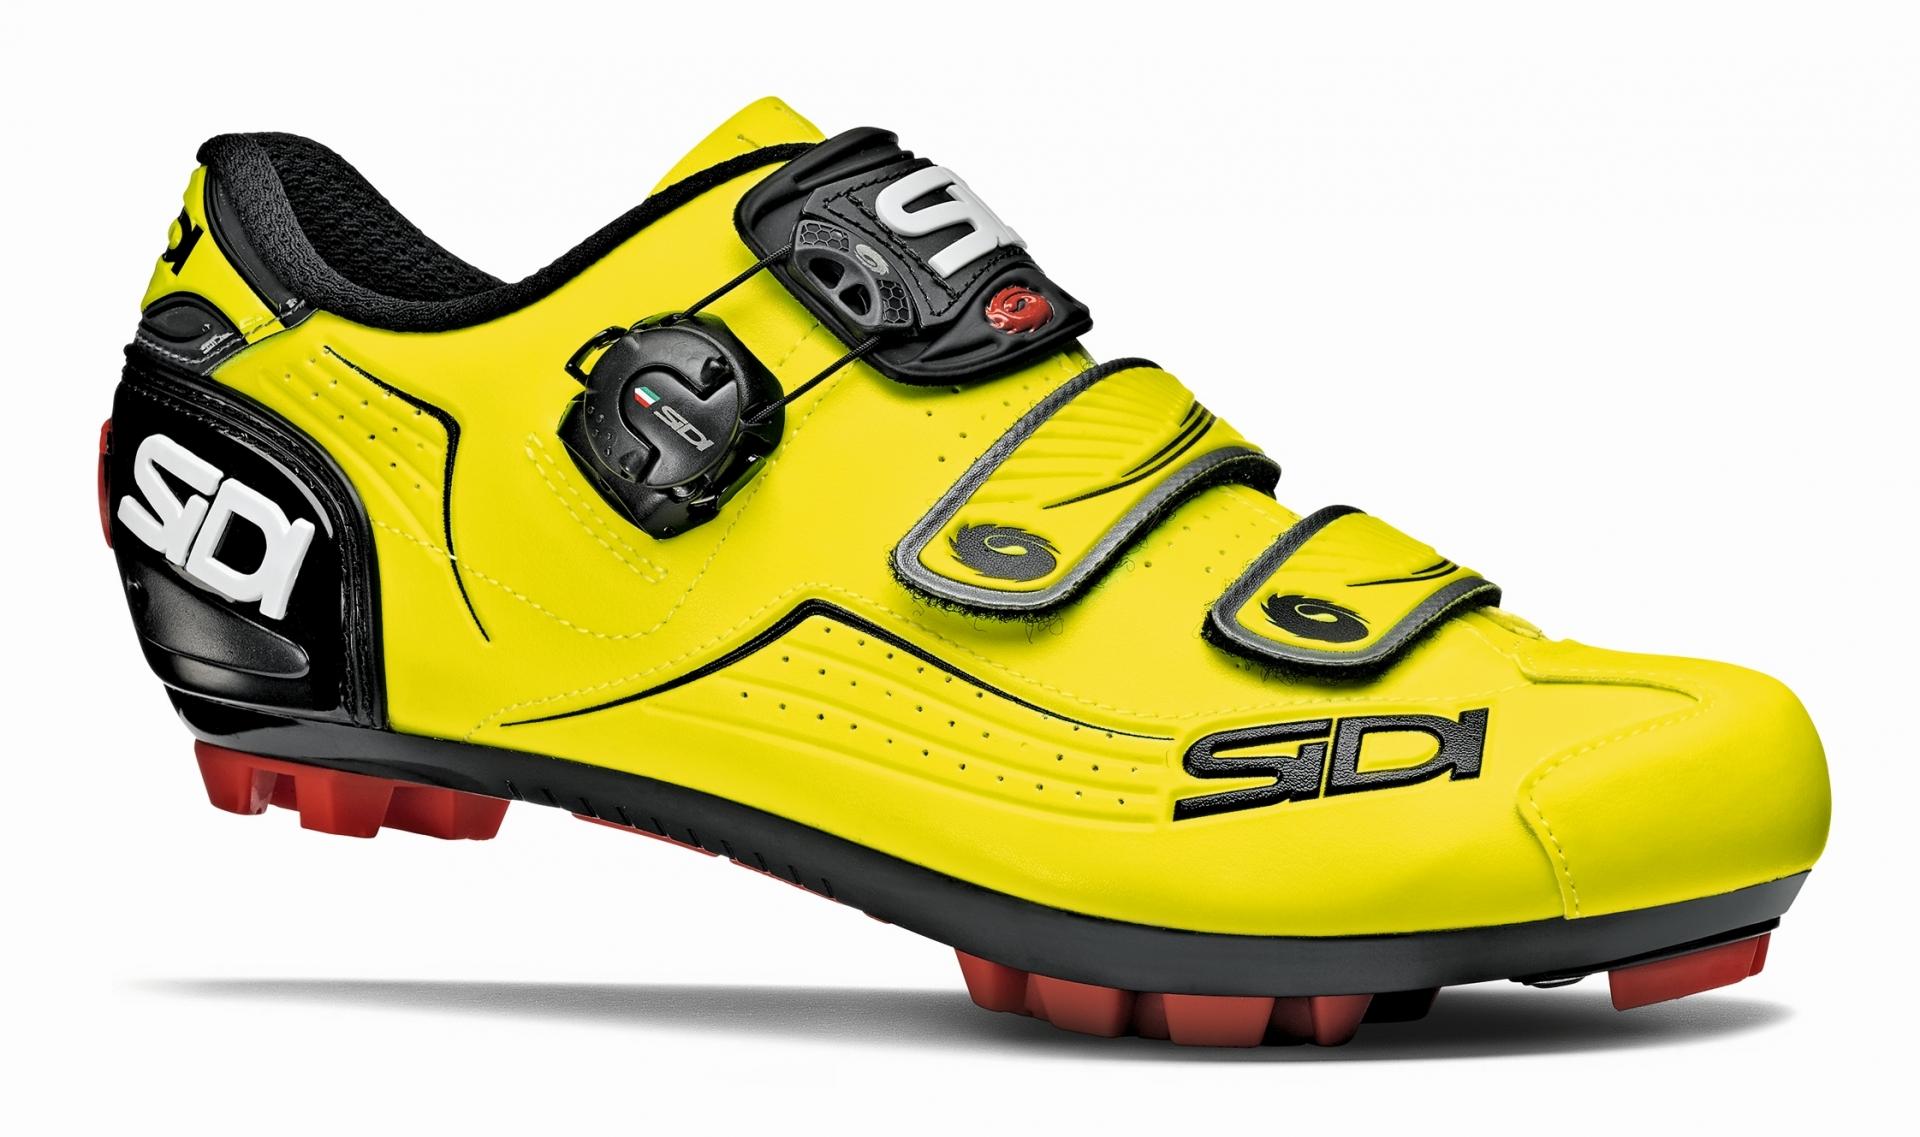 Chaussures VTT Sidi Trace Jaune fluo - 42